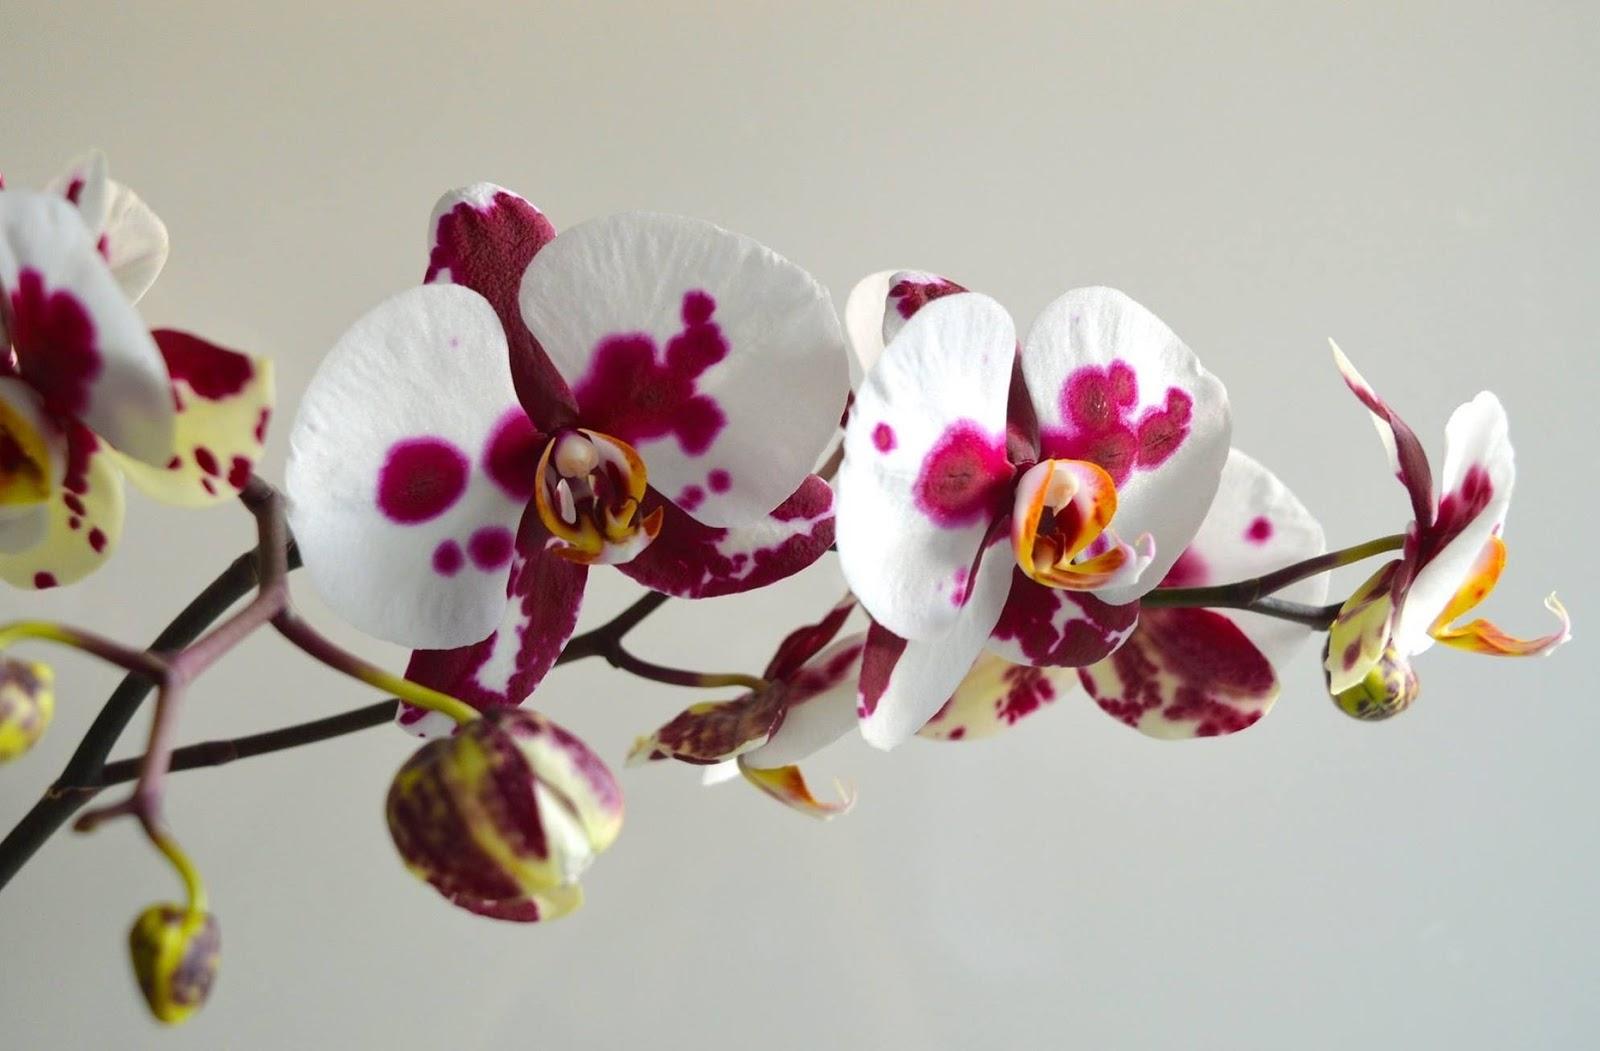 Gambar bunga anggrek variegata